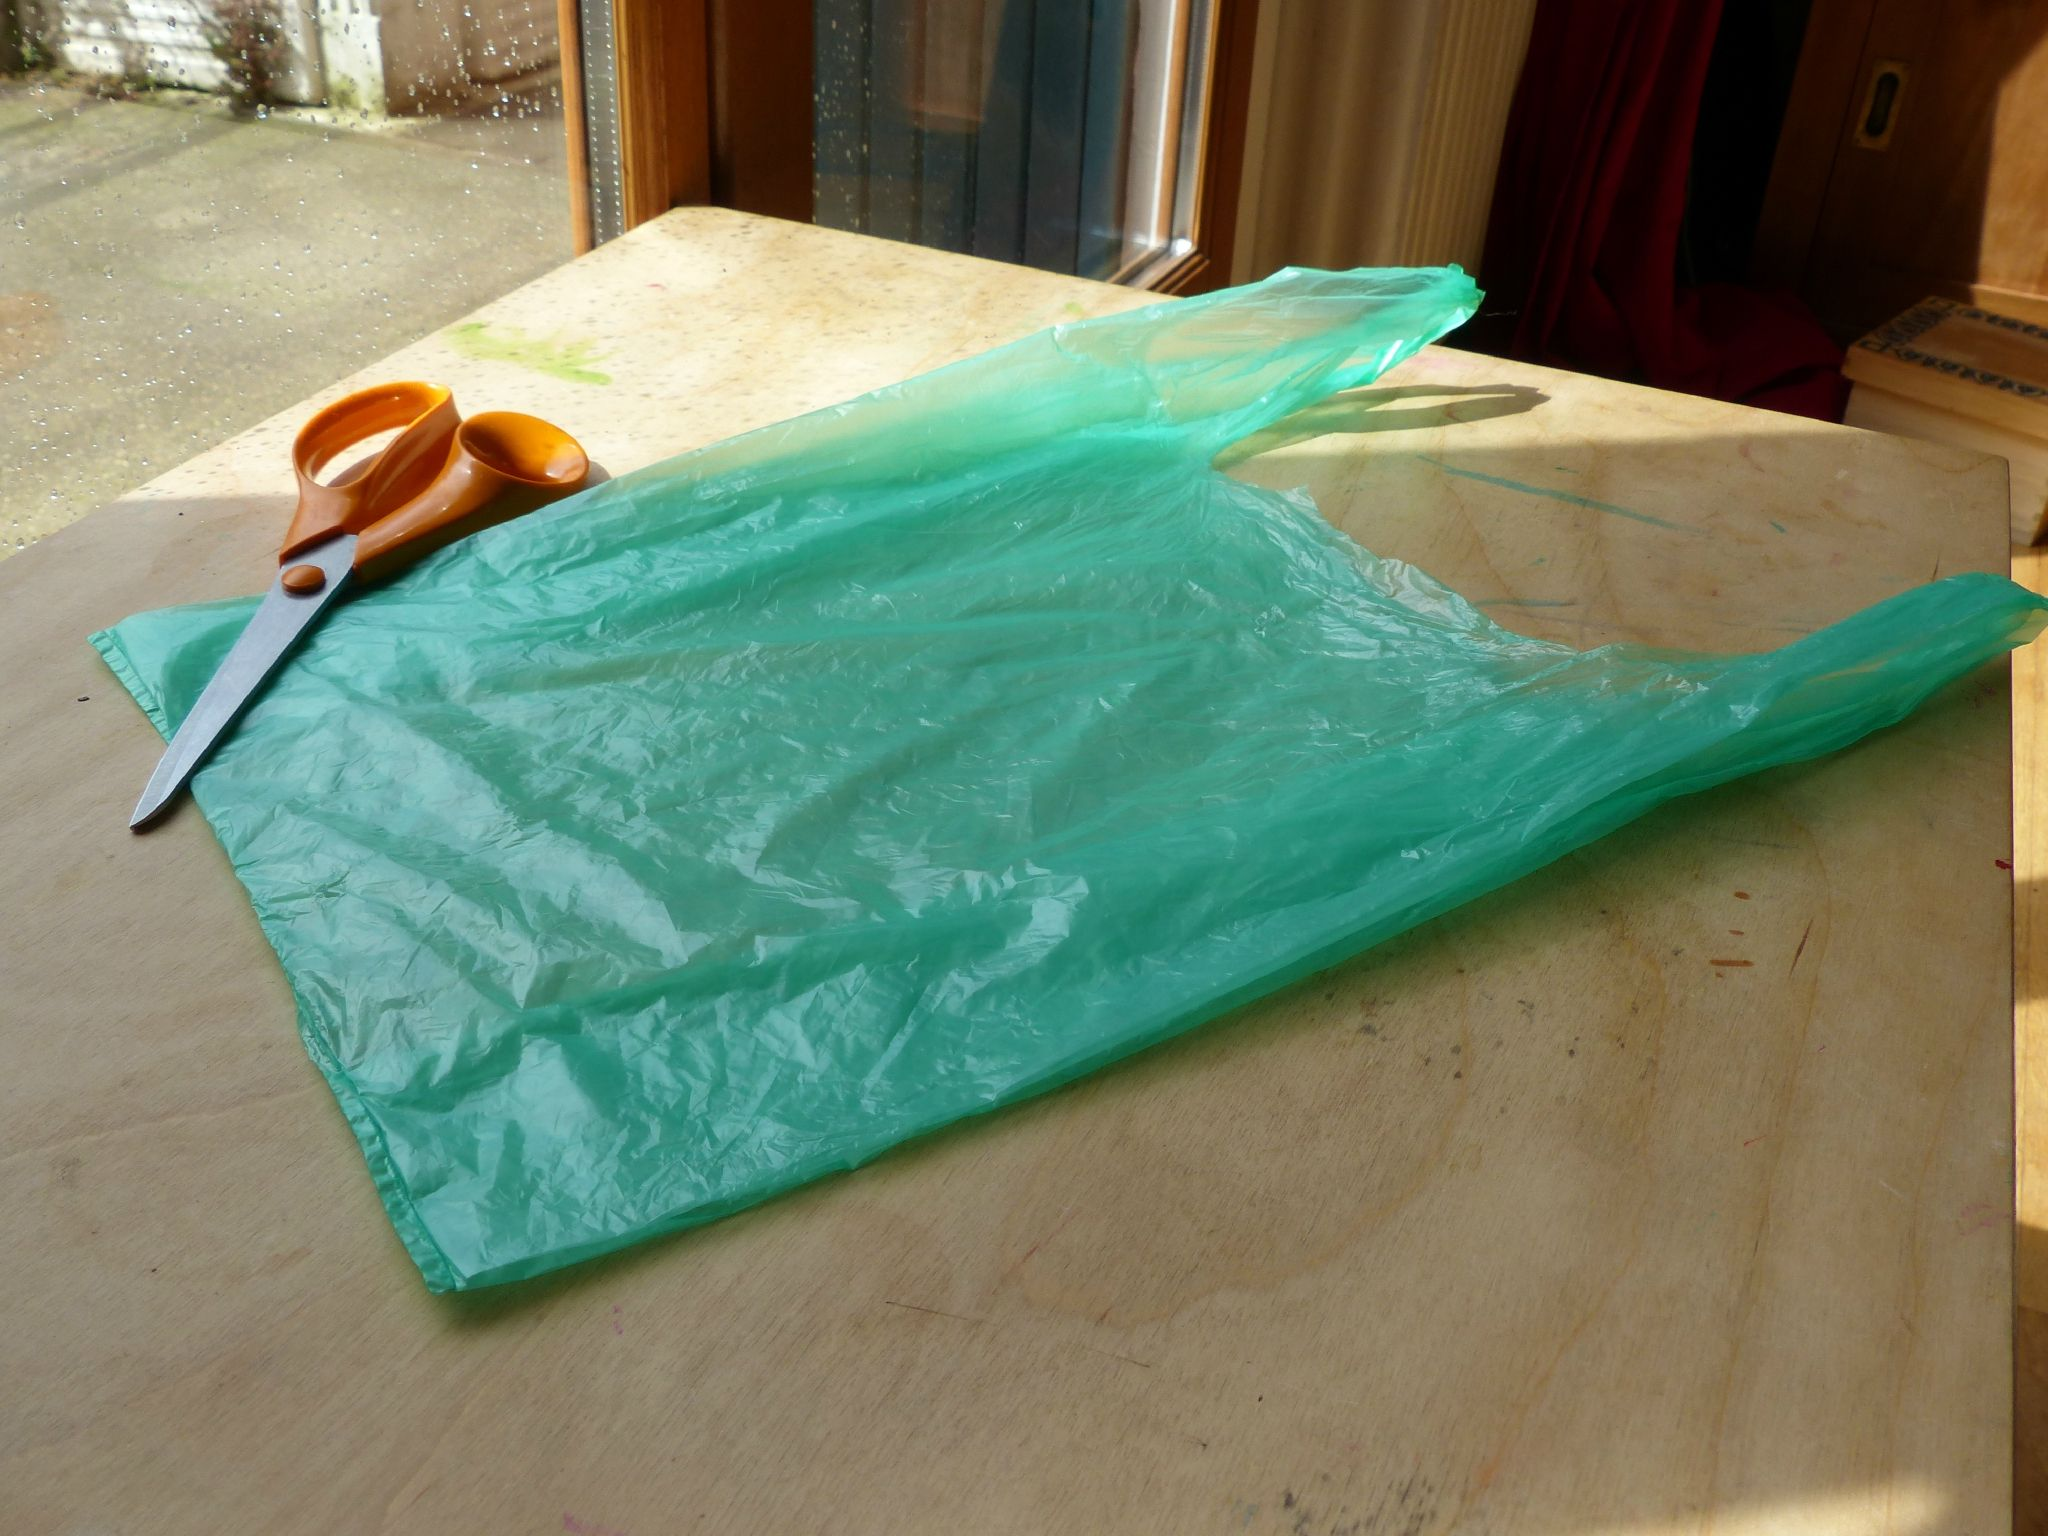 transformer un sac plastique en pelote tape 1 recyclage sac en plastic pinterest sac. Black Bedroom Furniture Sets. Home Design Ideas